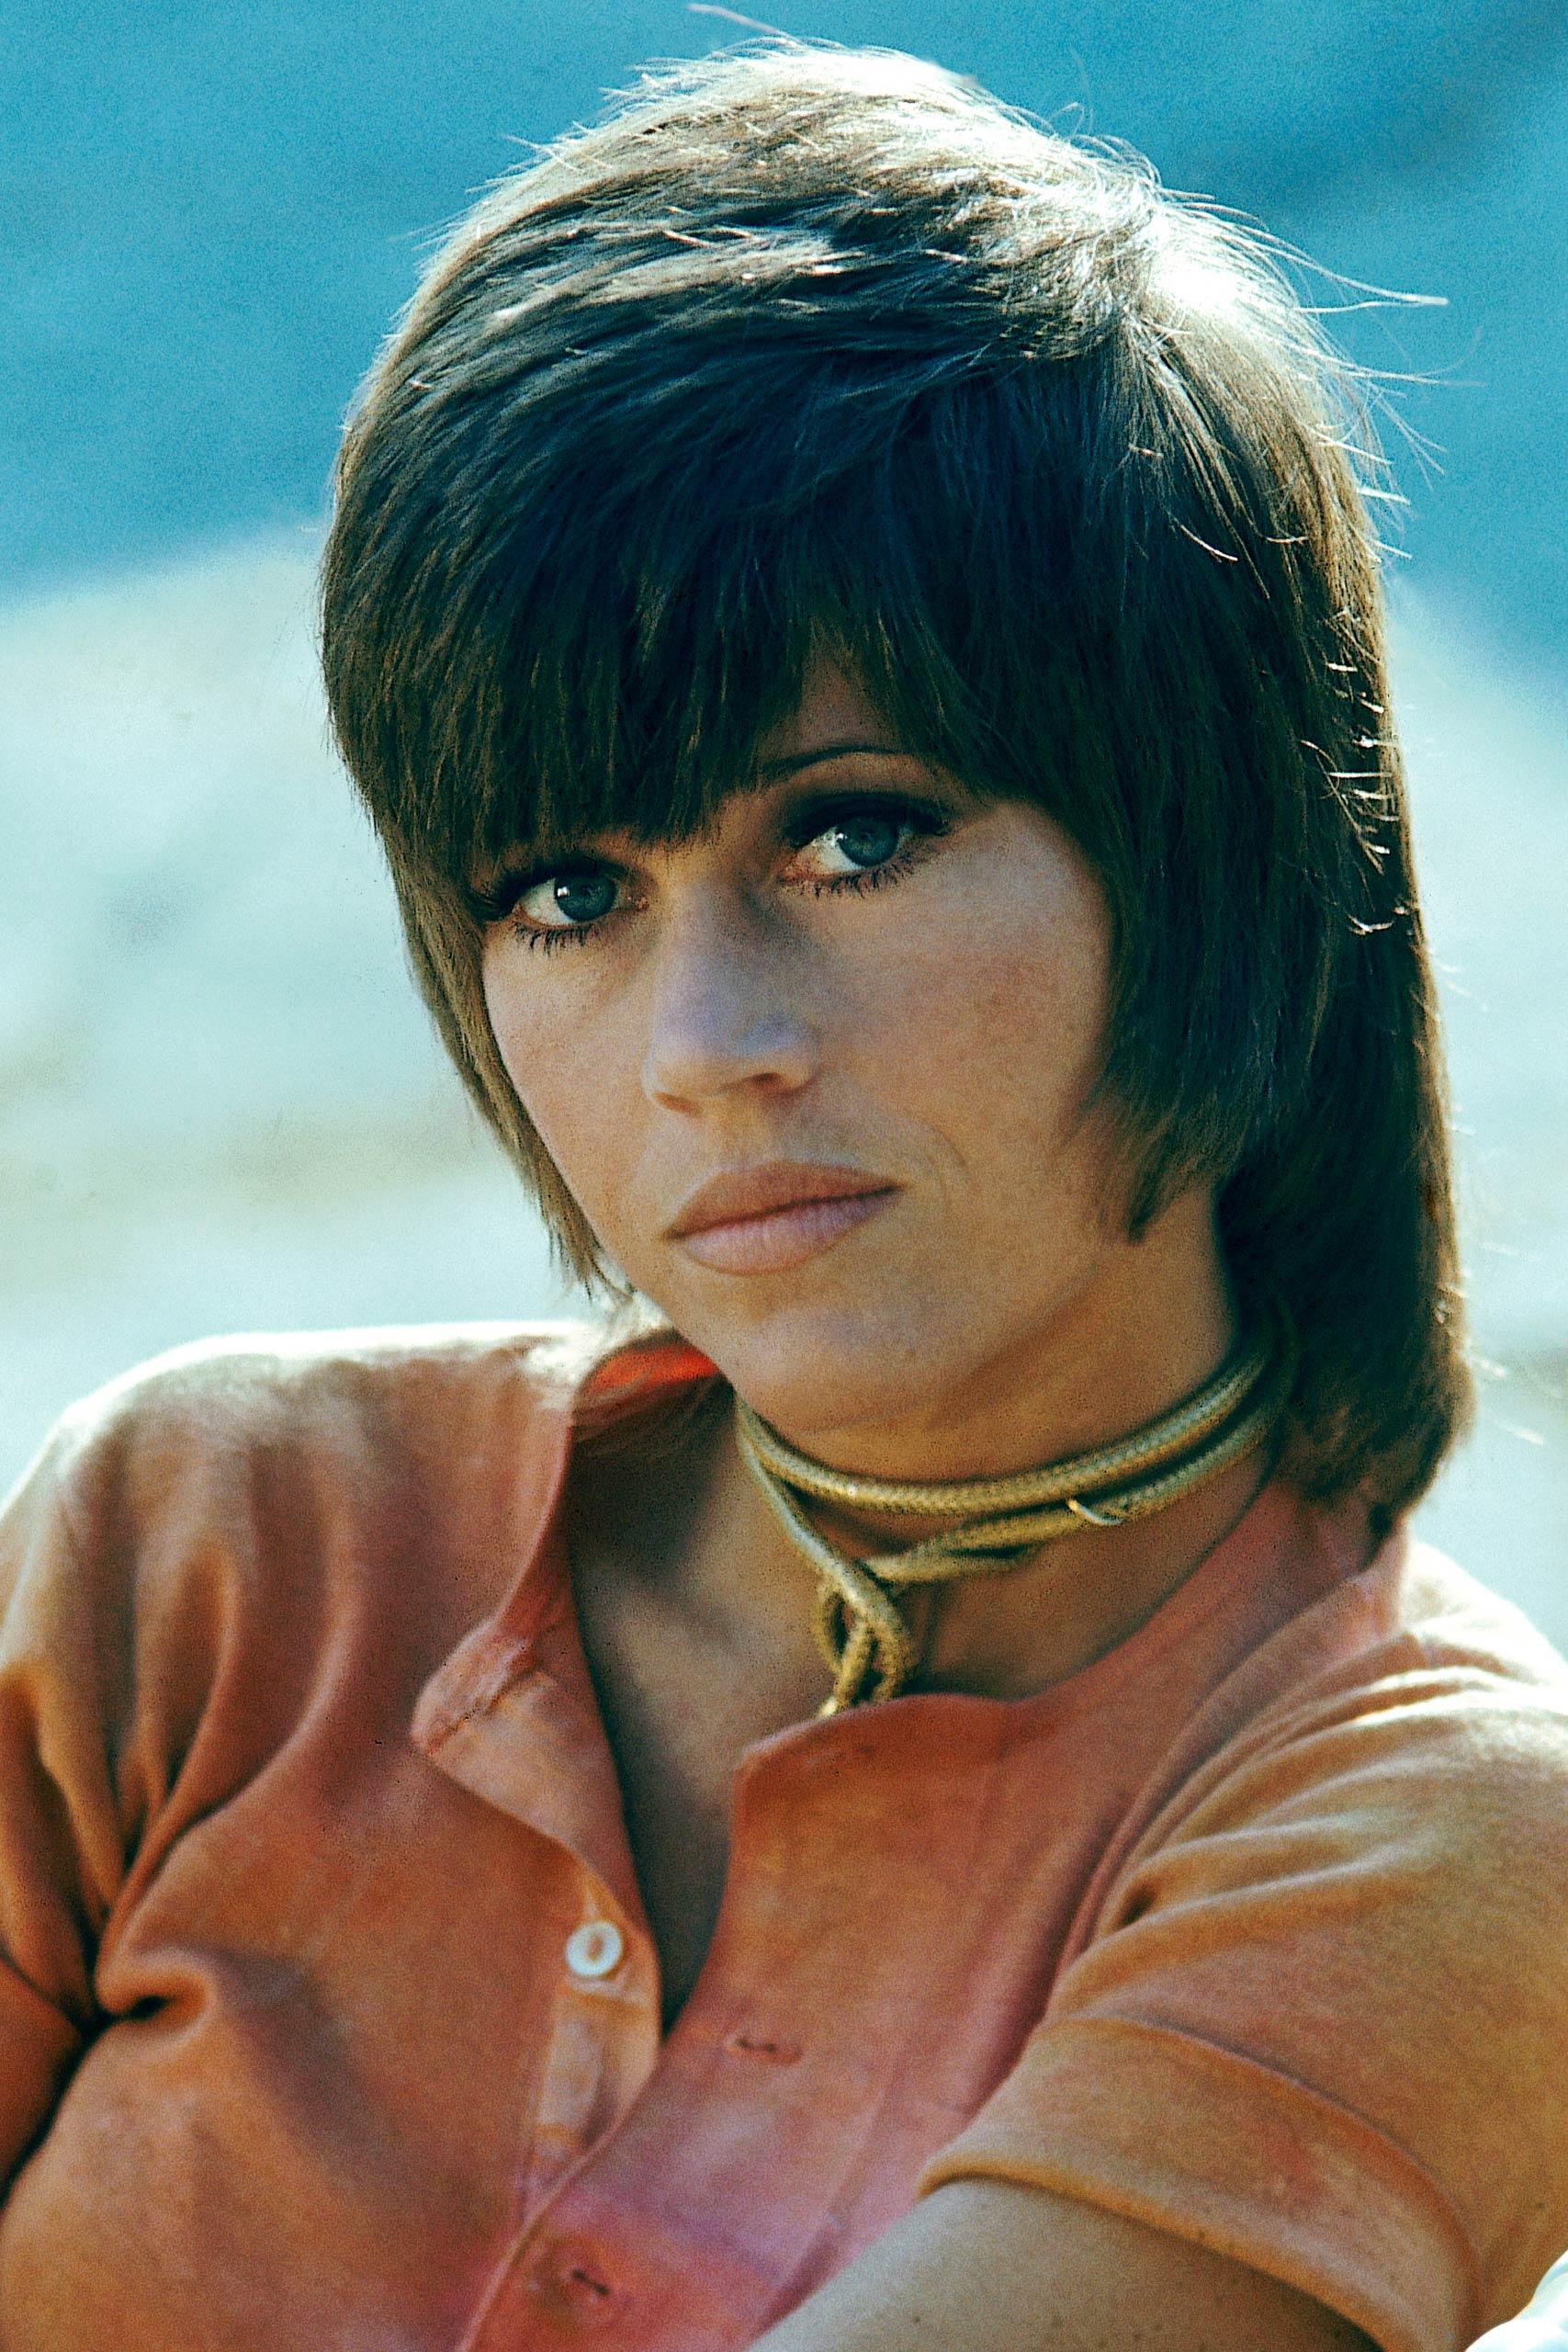 <strong>1972: Jane Fonda - <i> Klute</i>                                   1979: Jane Fonda - <i>Coming Home</i></strong>